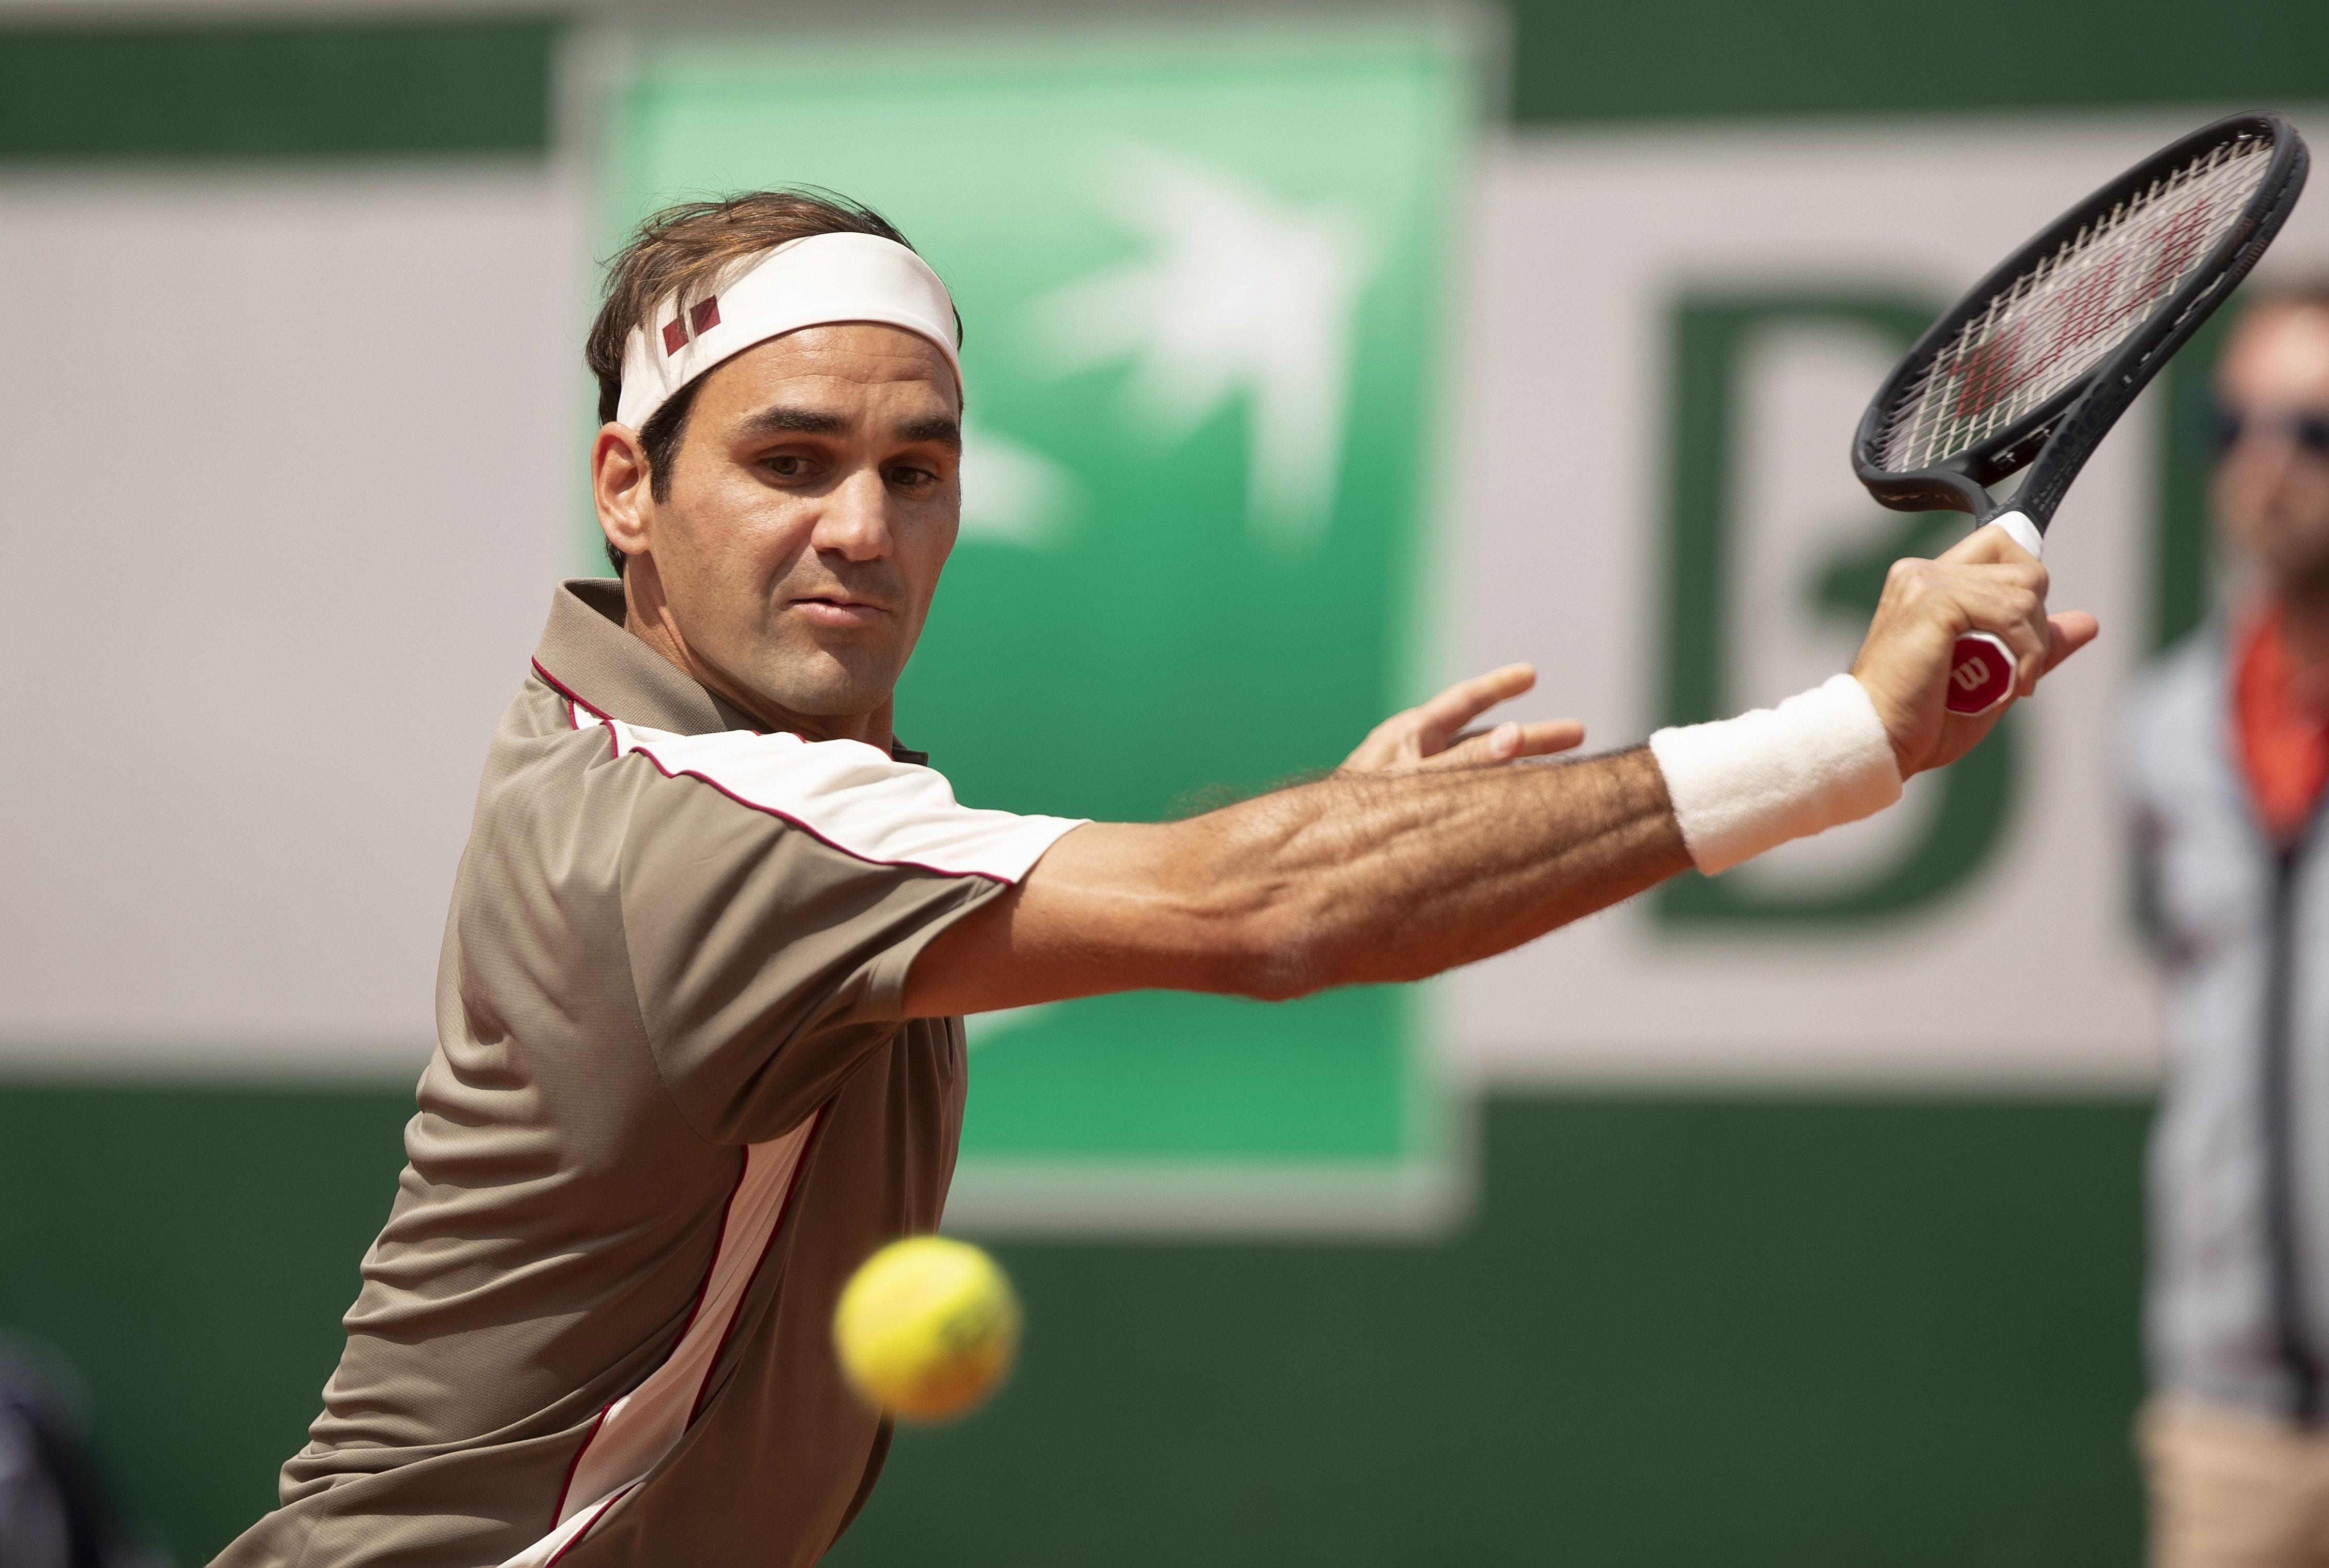 The Wimbledon Final: Federer vs. Djokovic